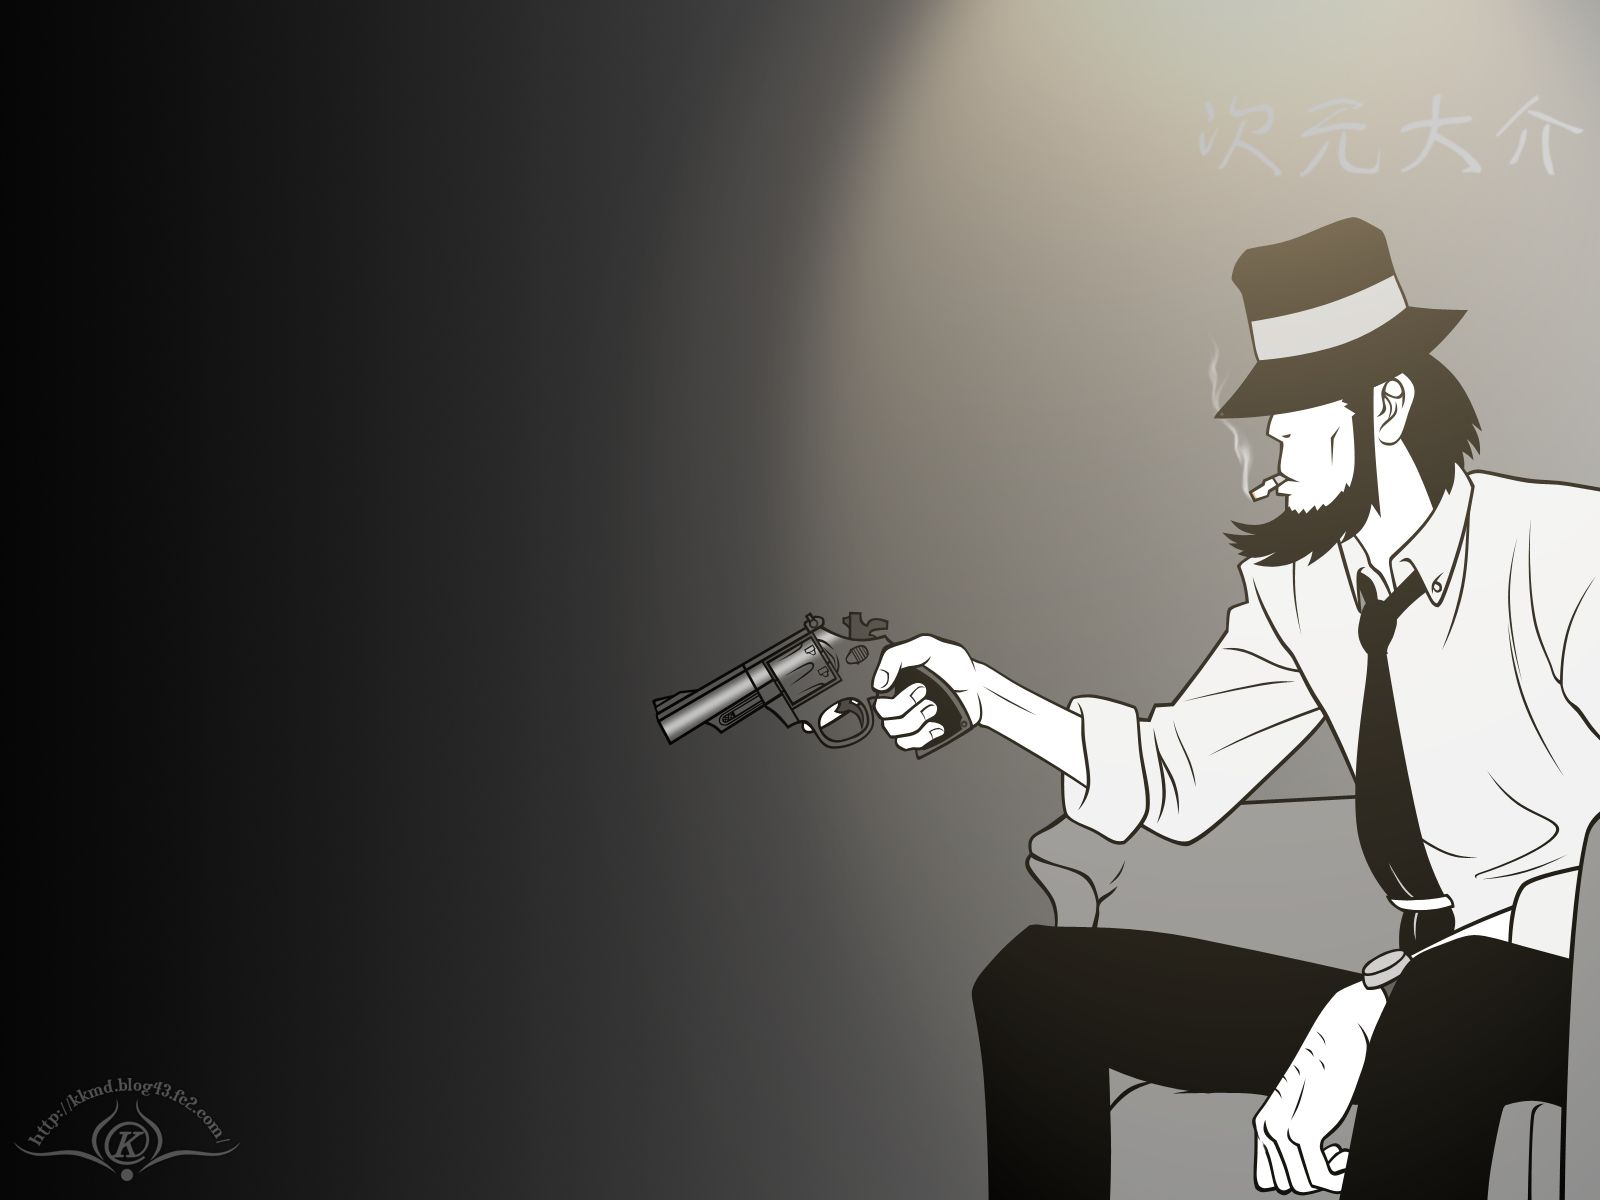 Lupin Iii おしゃれまとめの人気アイデア Pinterest Shawnchang